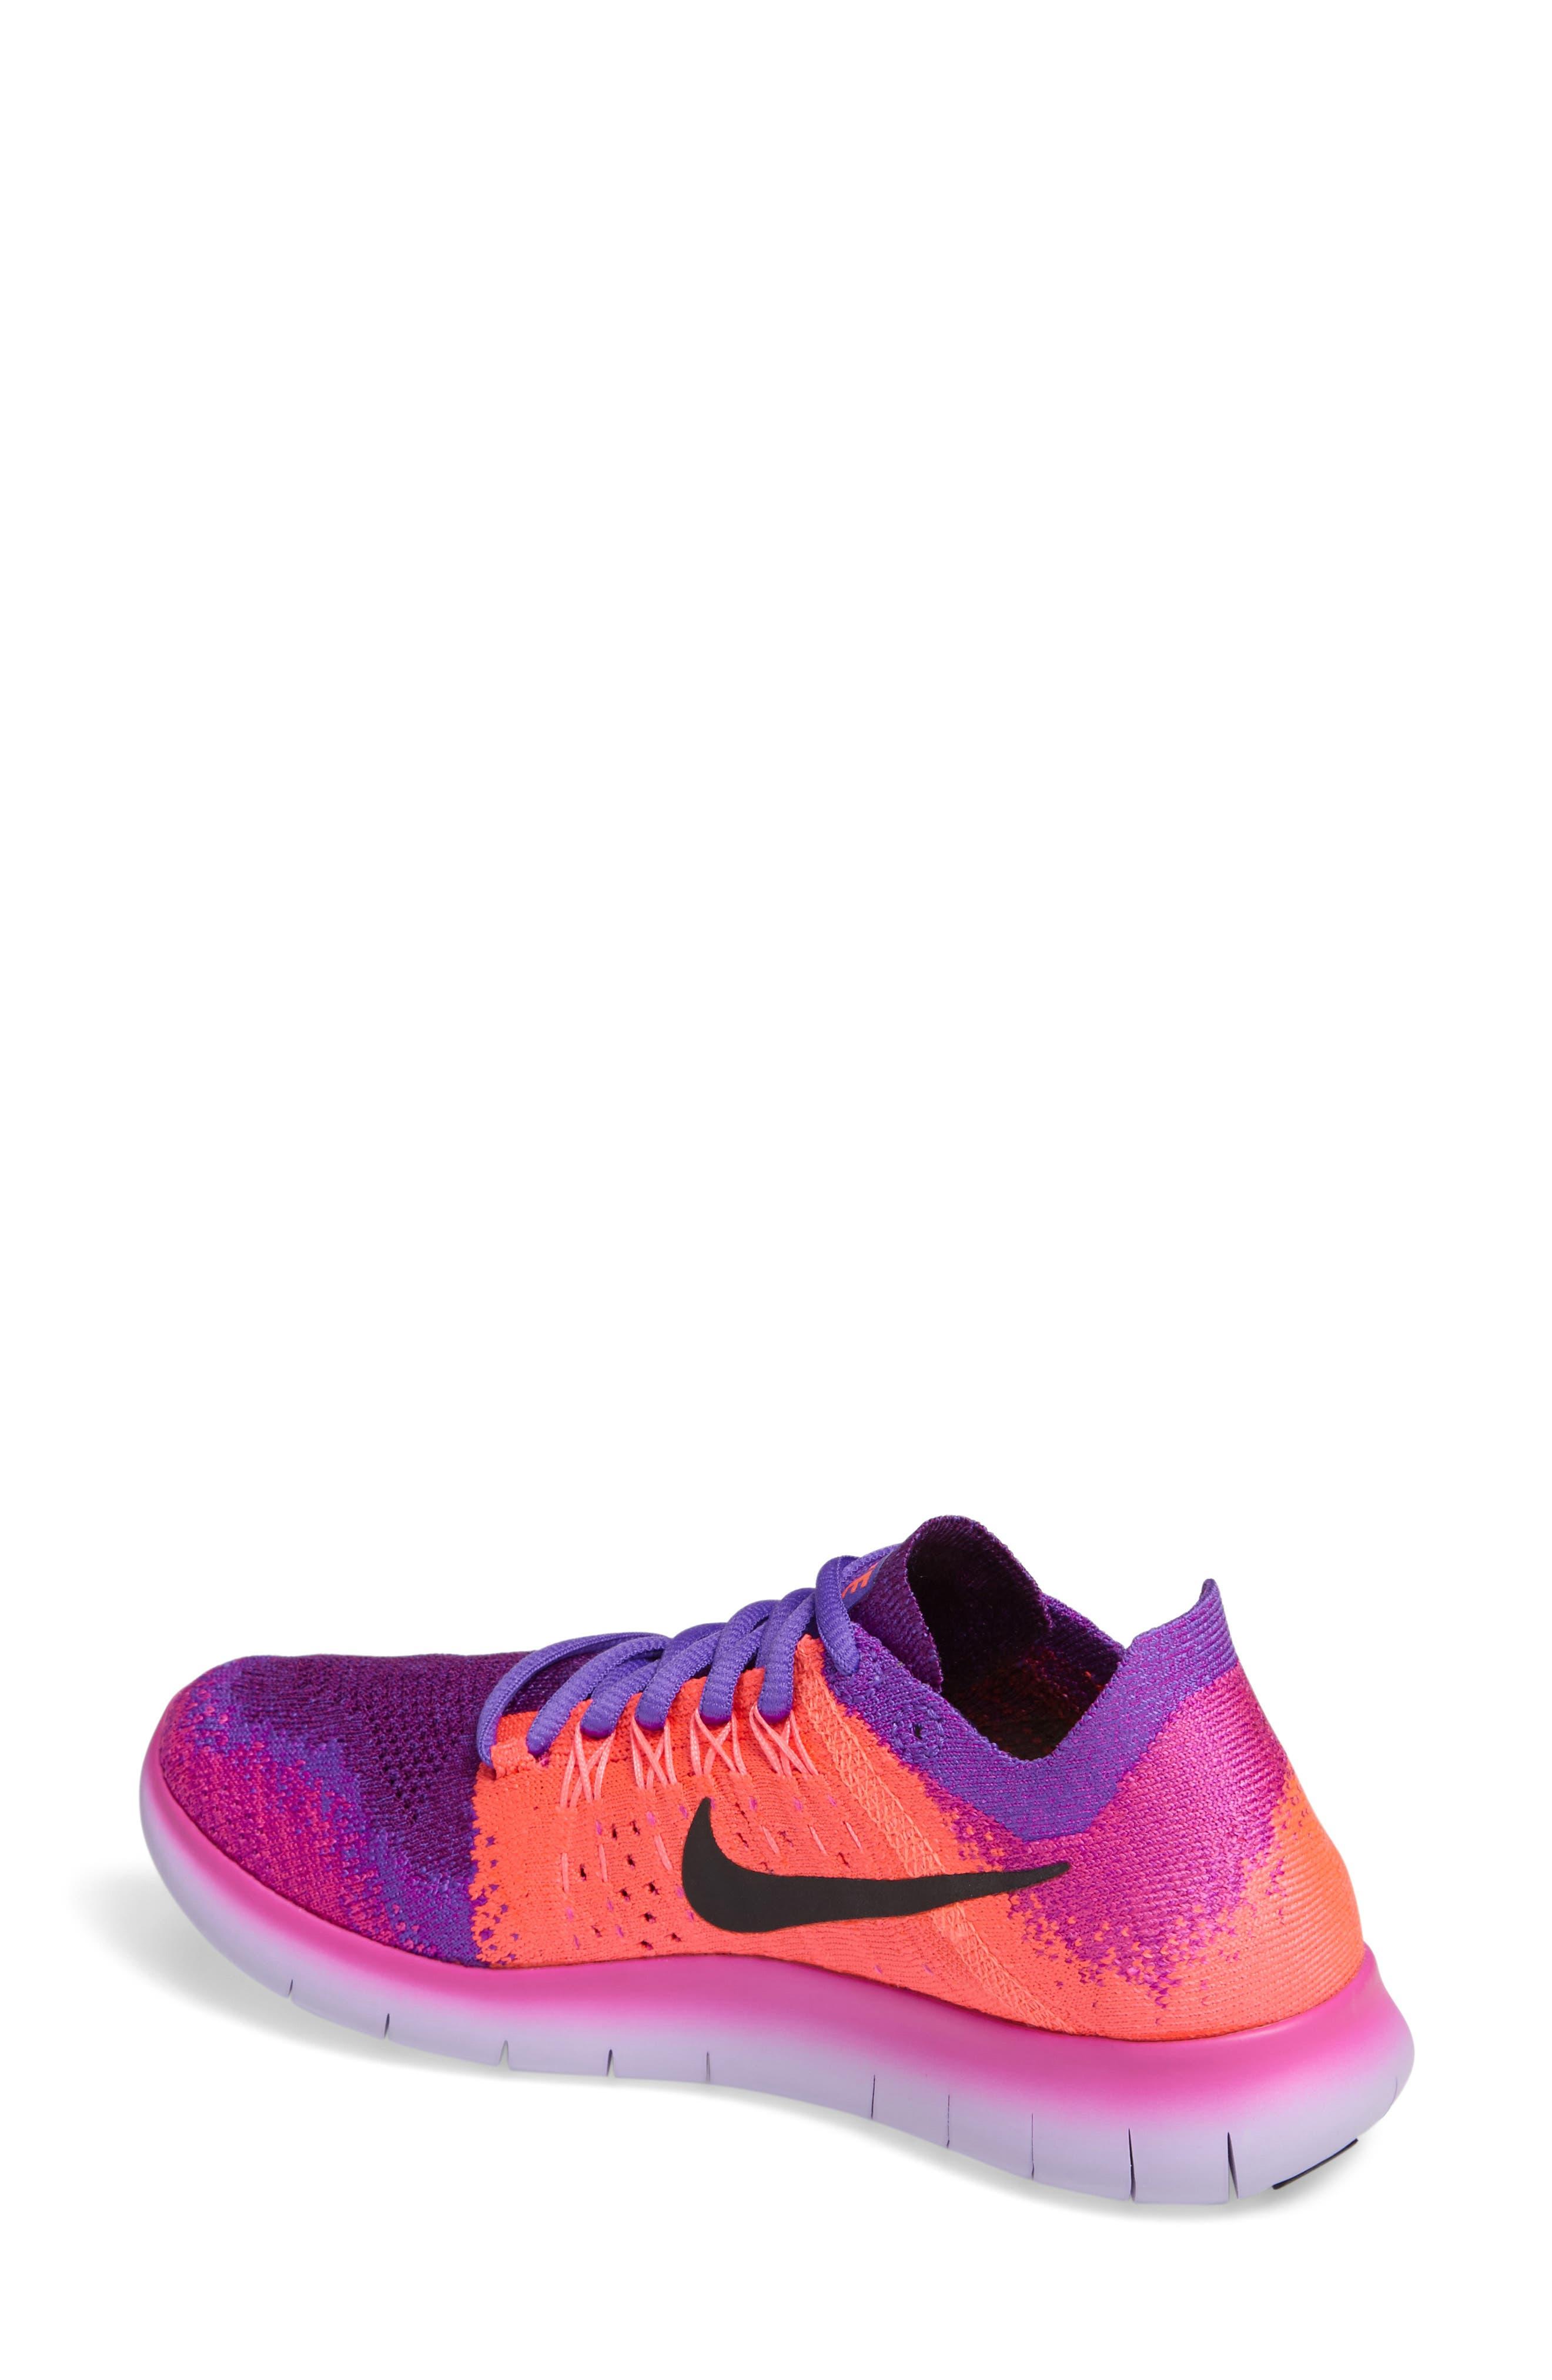 Alternate Image 2  - Nike Free RN Flyknit 2 Running Shoe (Women)